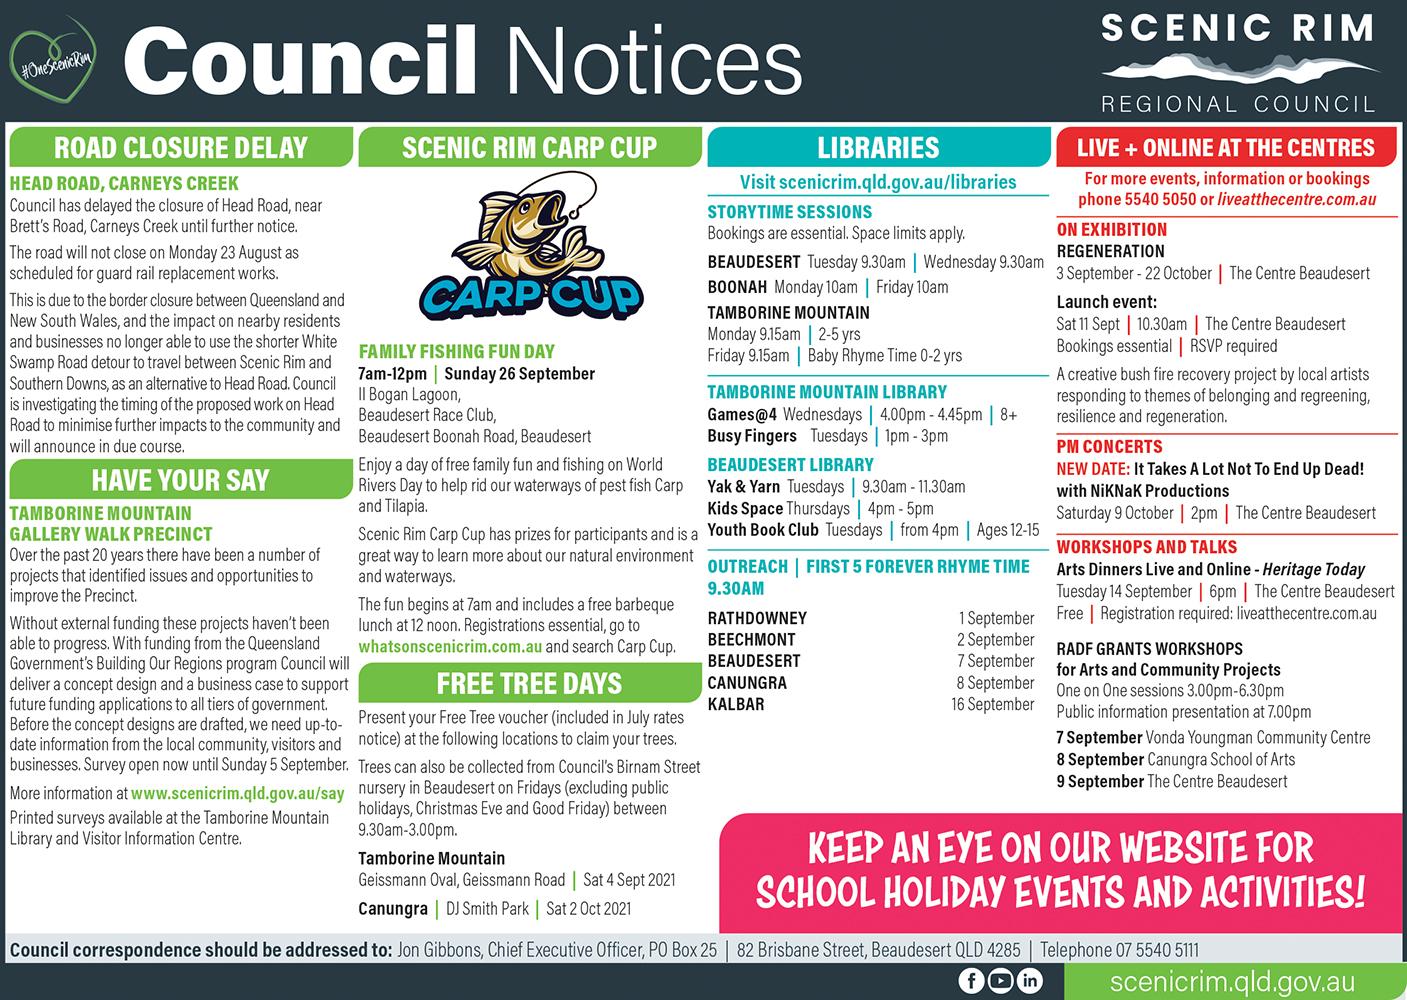 Scenic Rim Regional Council Notices - September 2021